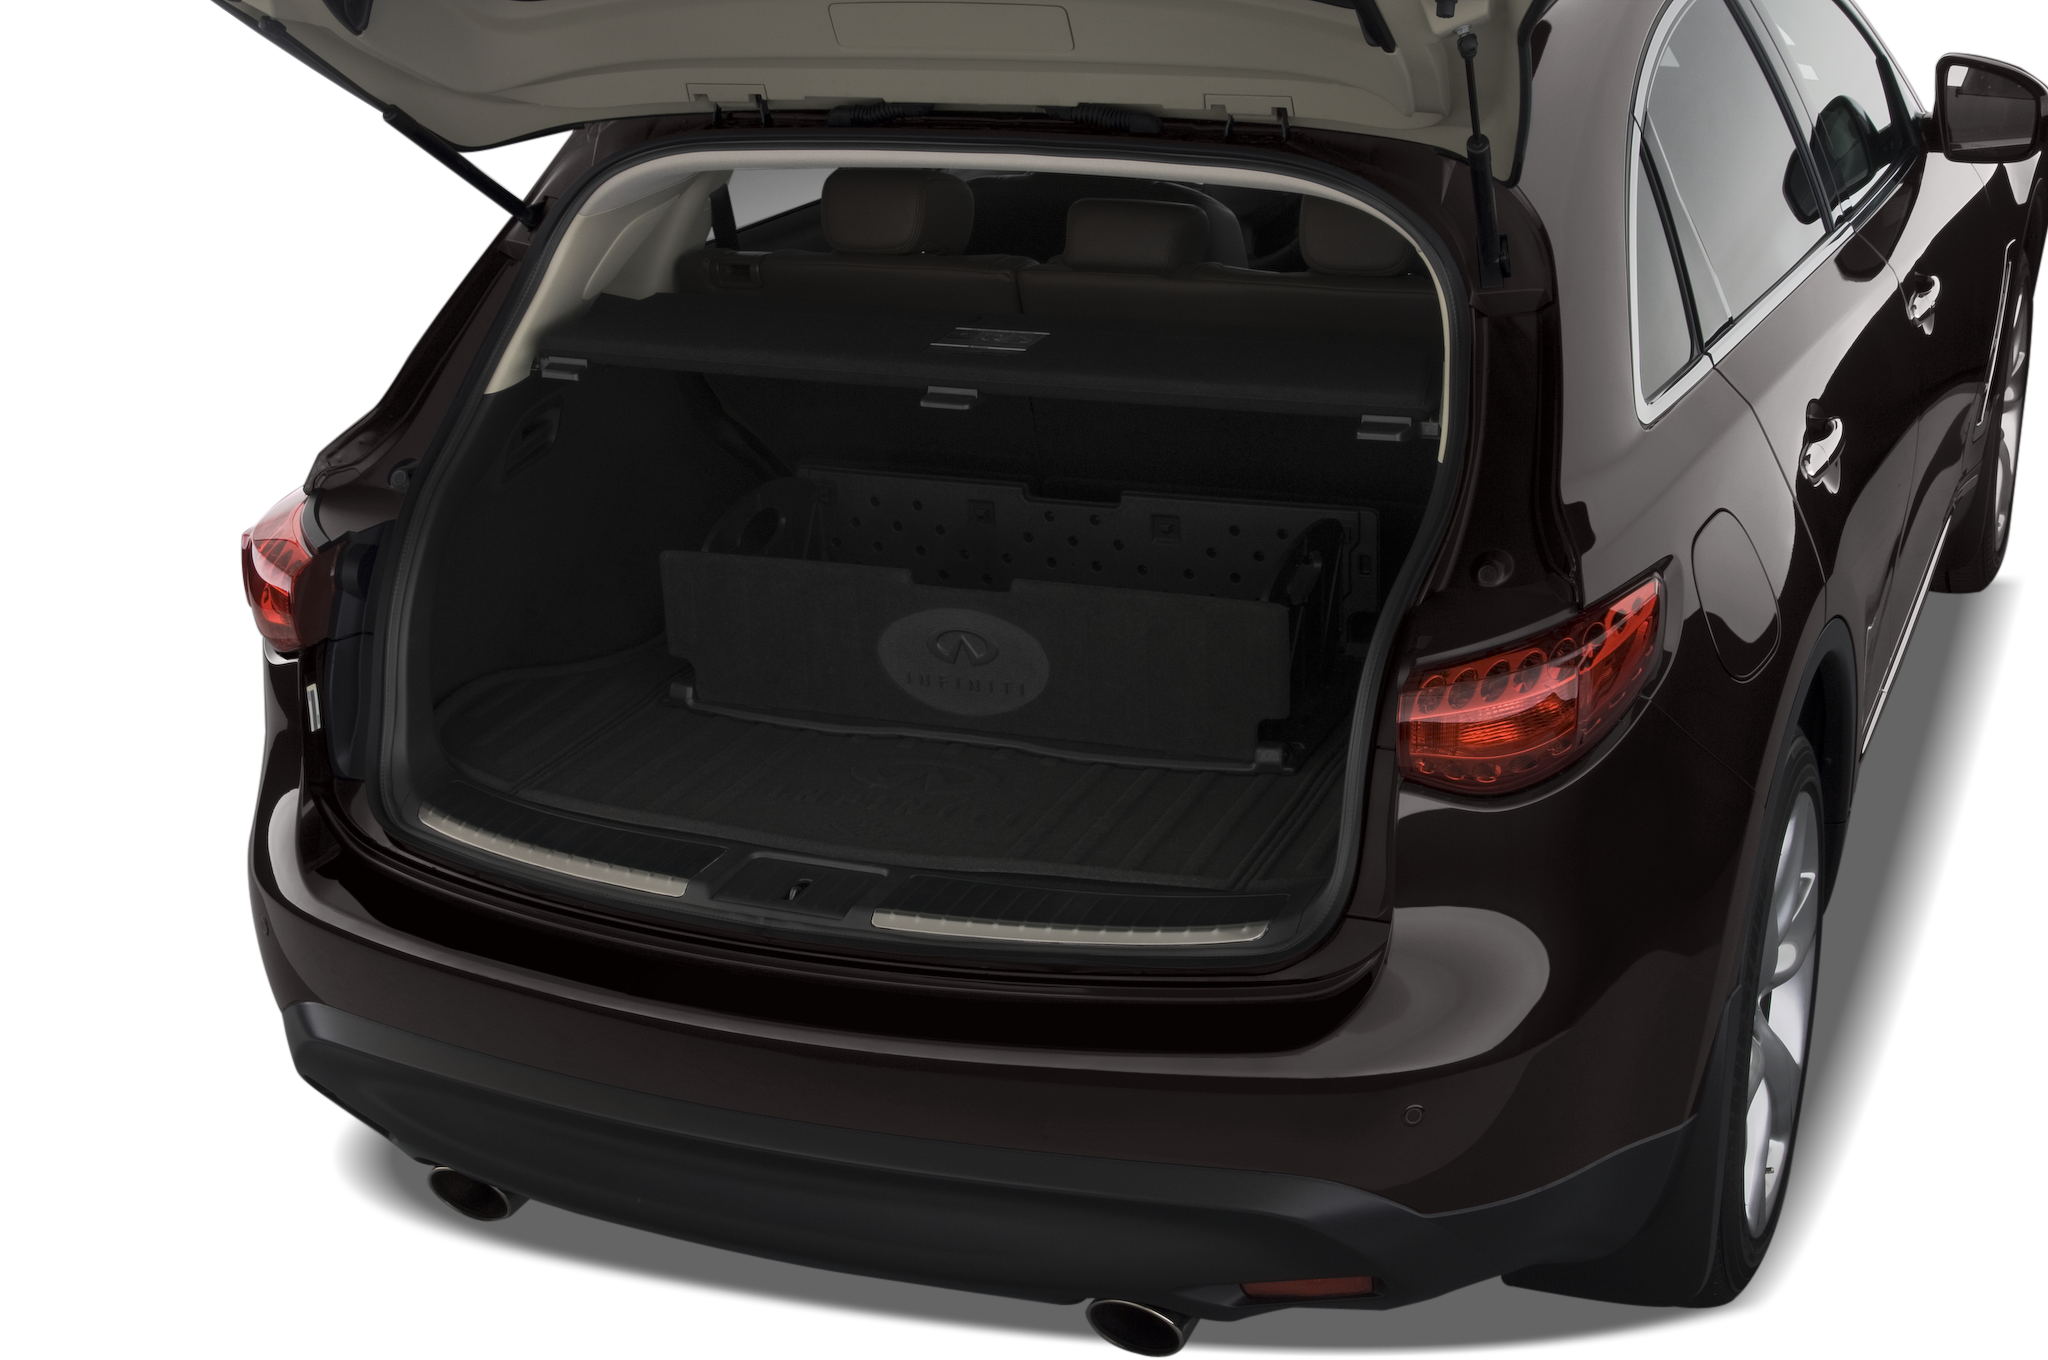 2012 Infiniti Fx Gets Mild Facelift Base Price Set At 43450 Fx35 Tail Light Wiring Diagram 9 50